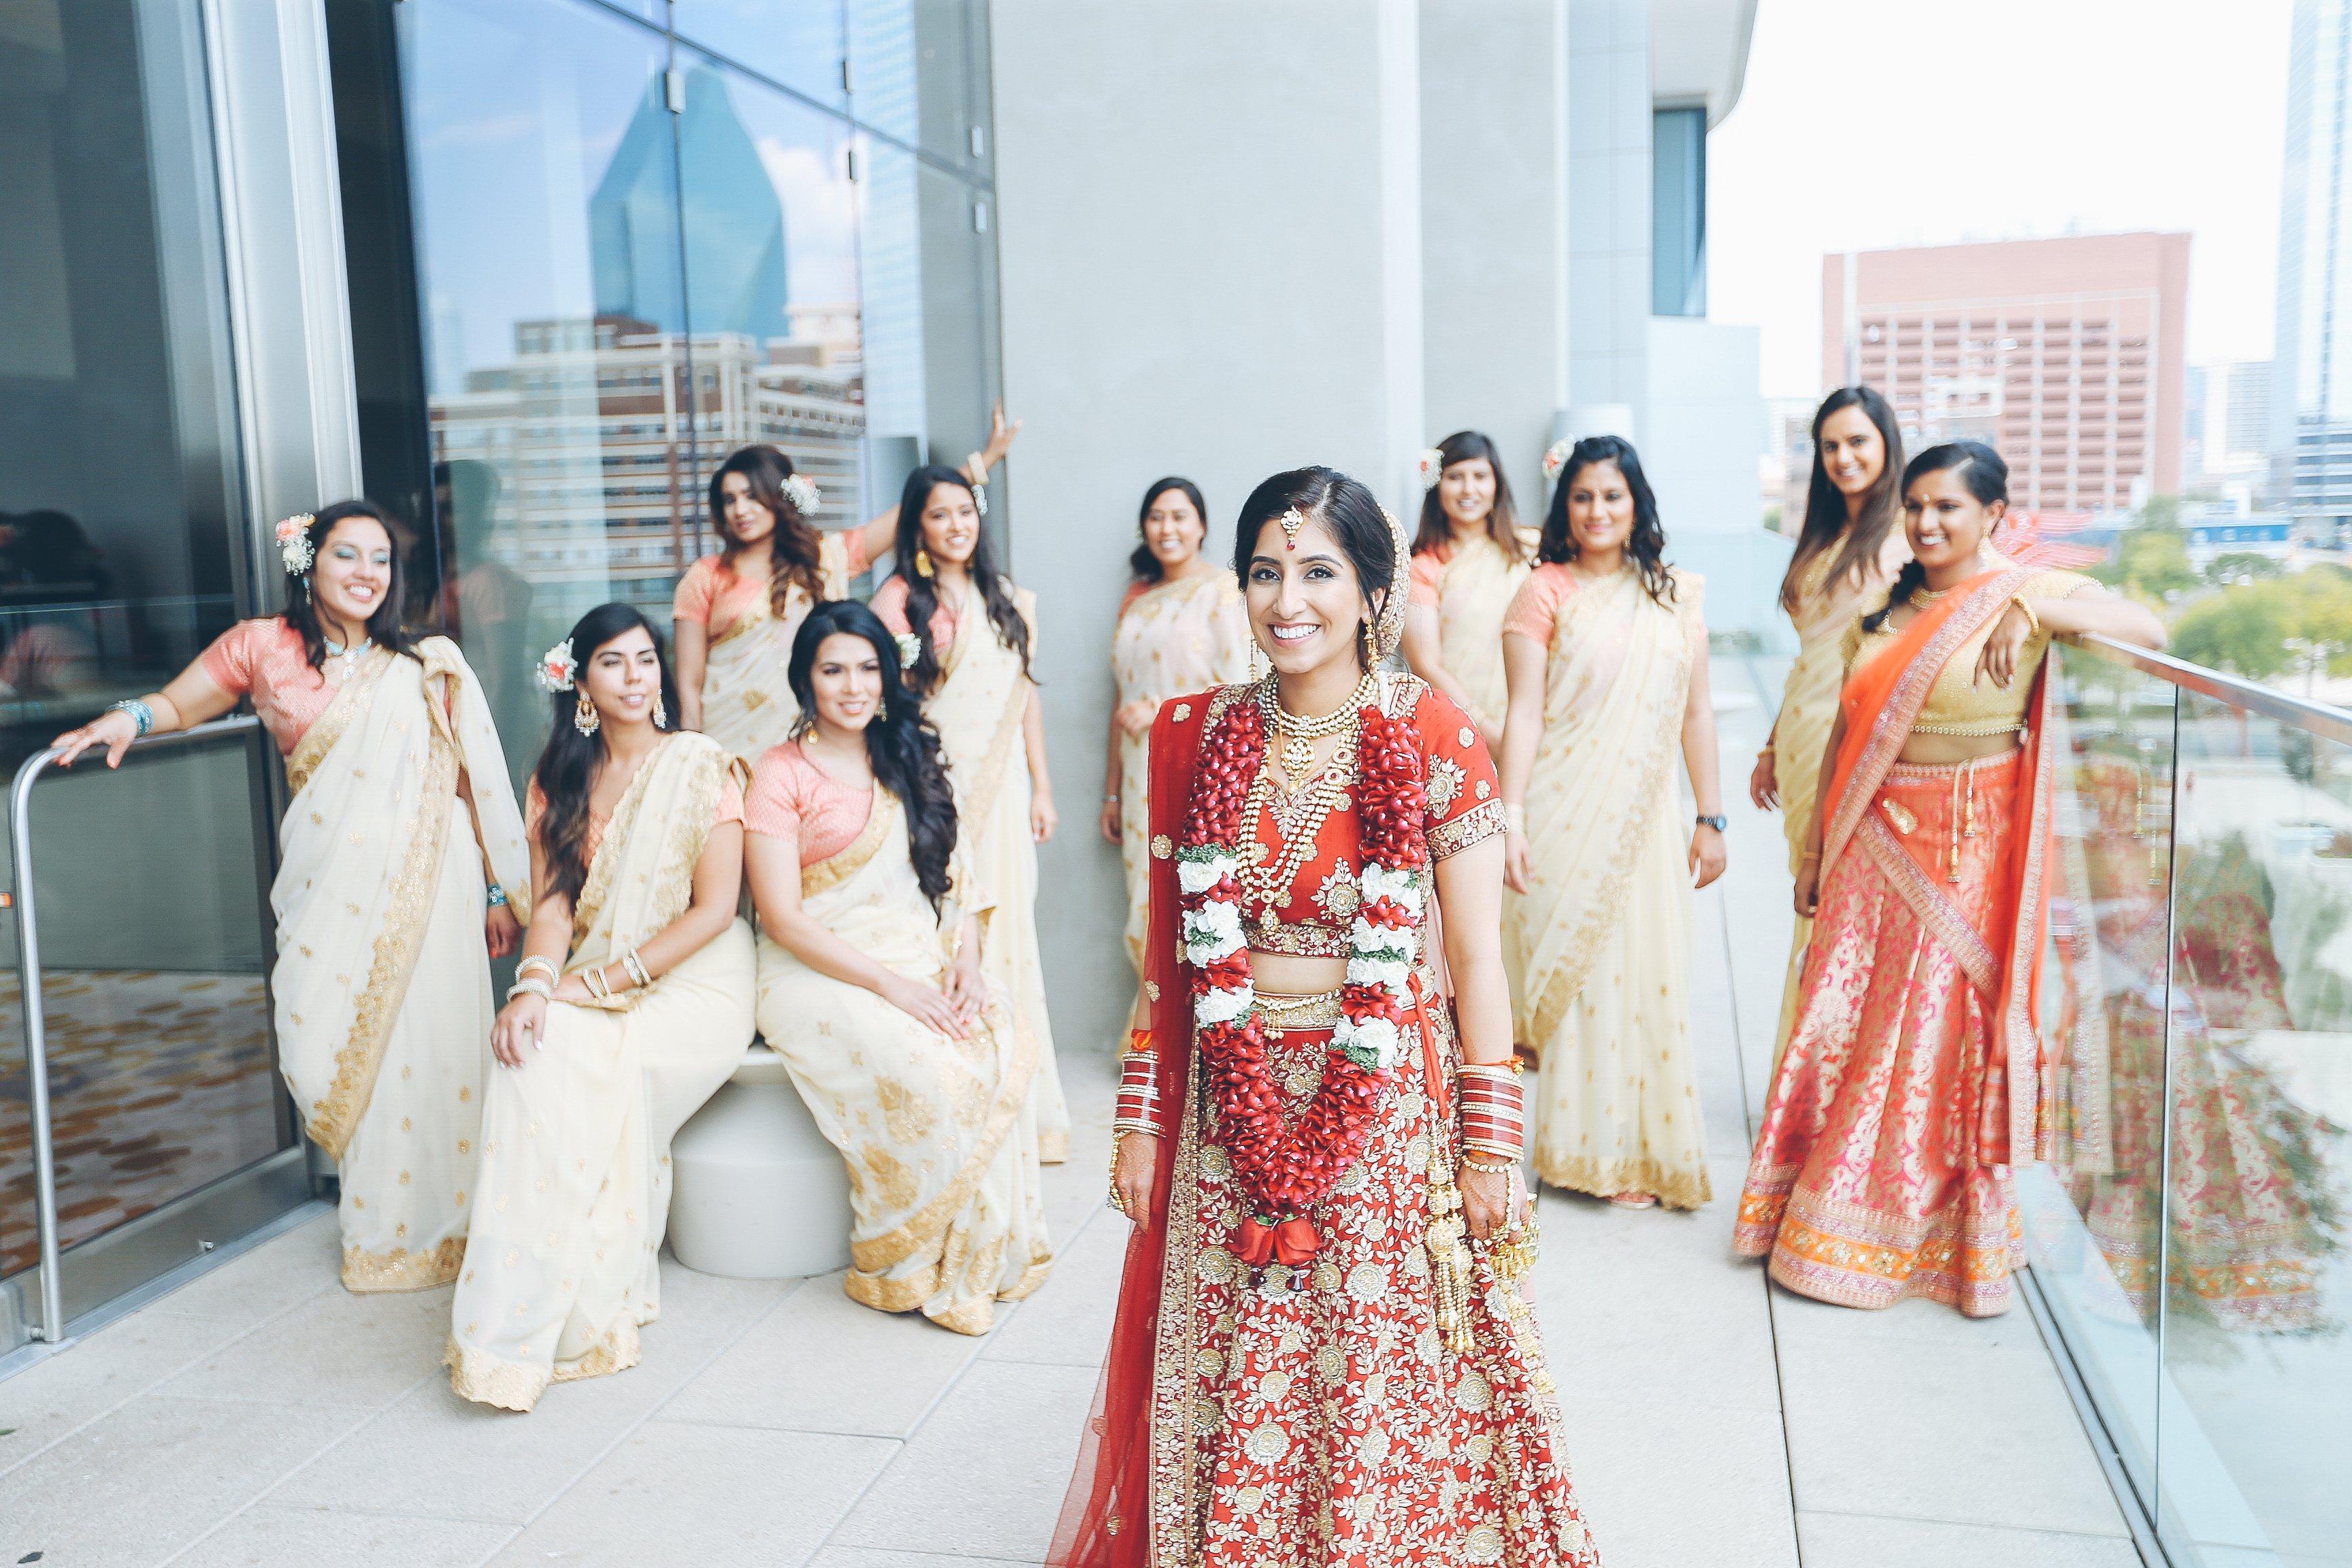 Top 18 Indian Wedding Reception Bridesmaids Entrance Songs